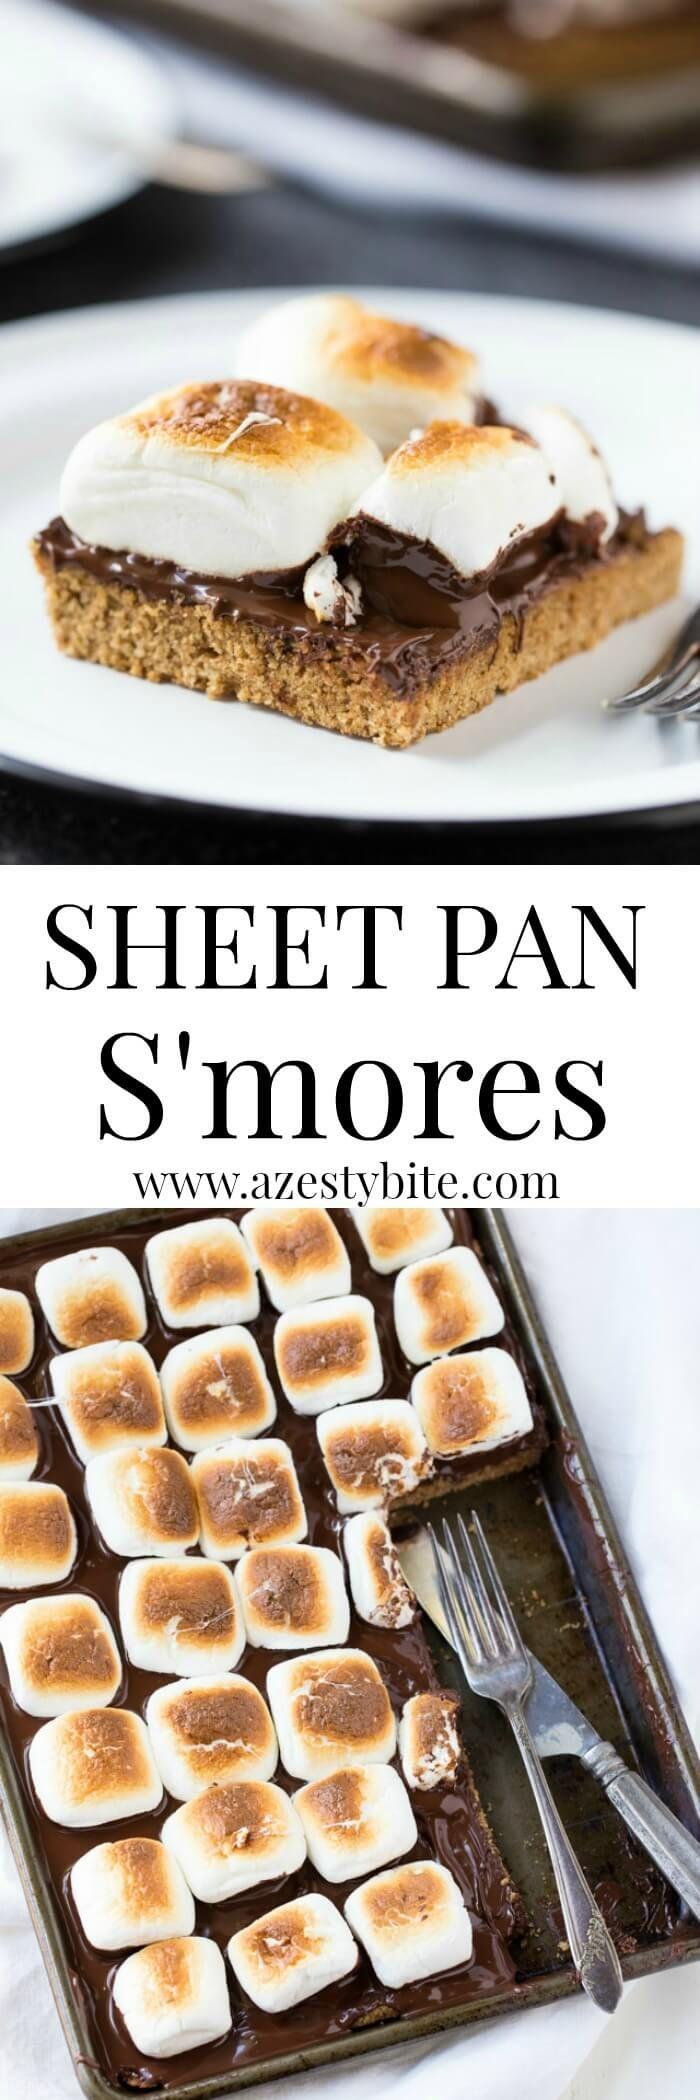 Sheet Pan S'mores (Smores Dessert Recipes)